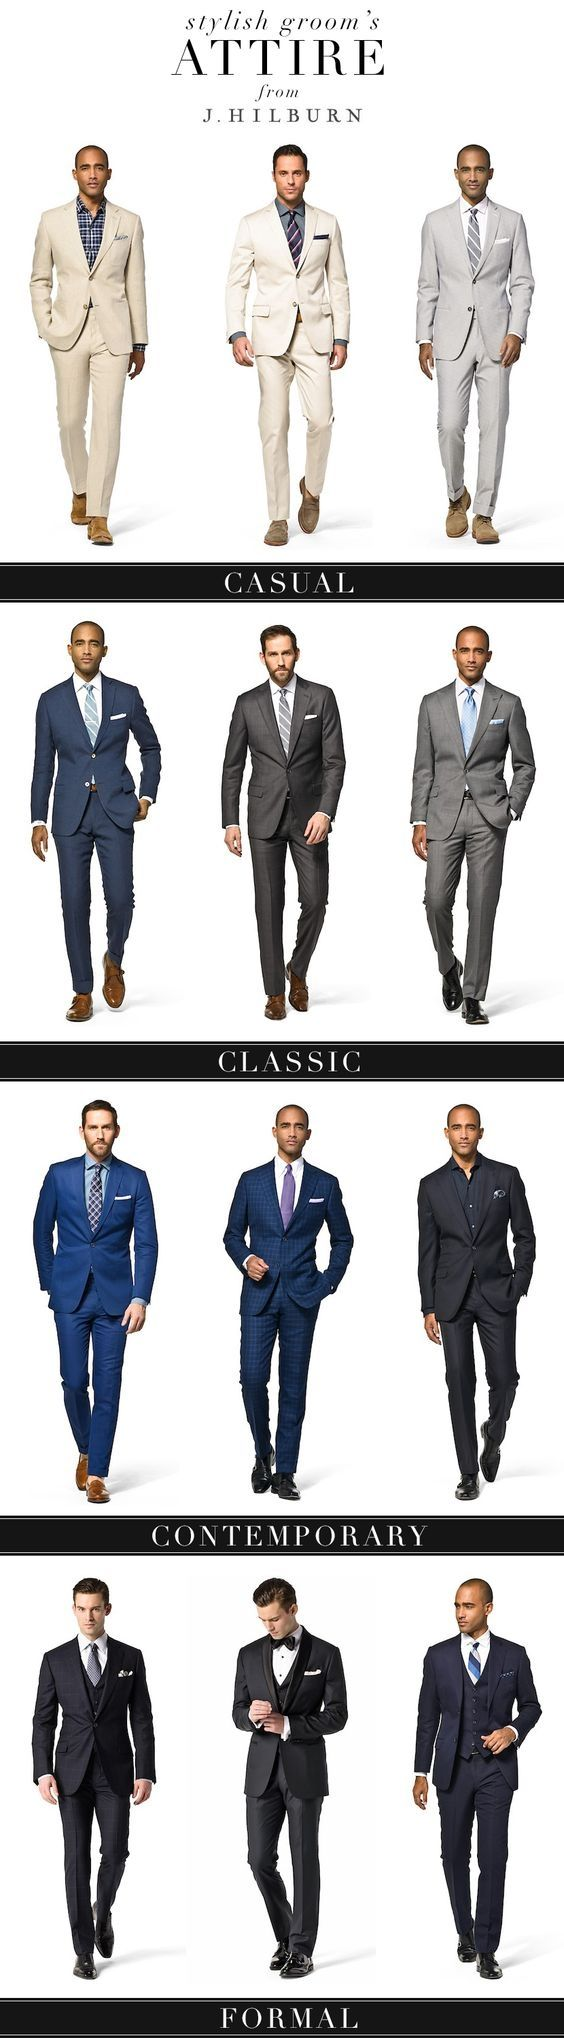 Estilos dos ternos u dress code nuevo pinterest man style